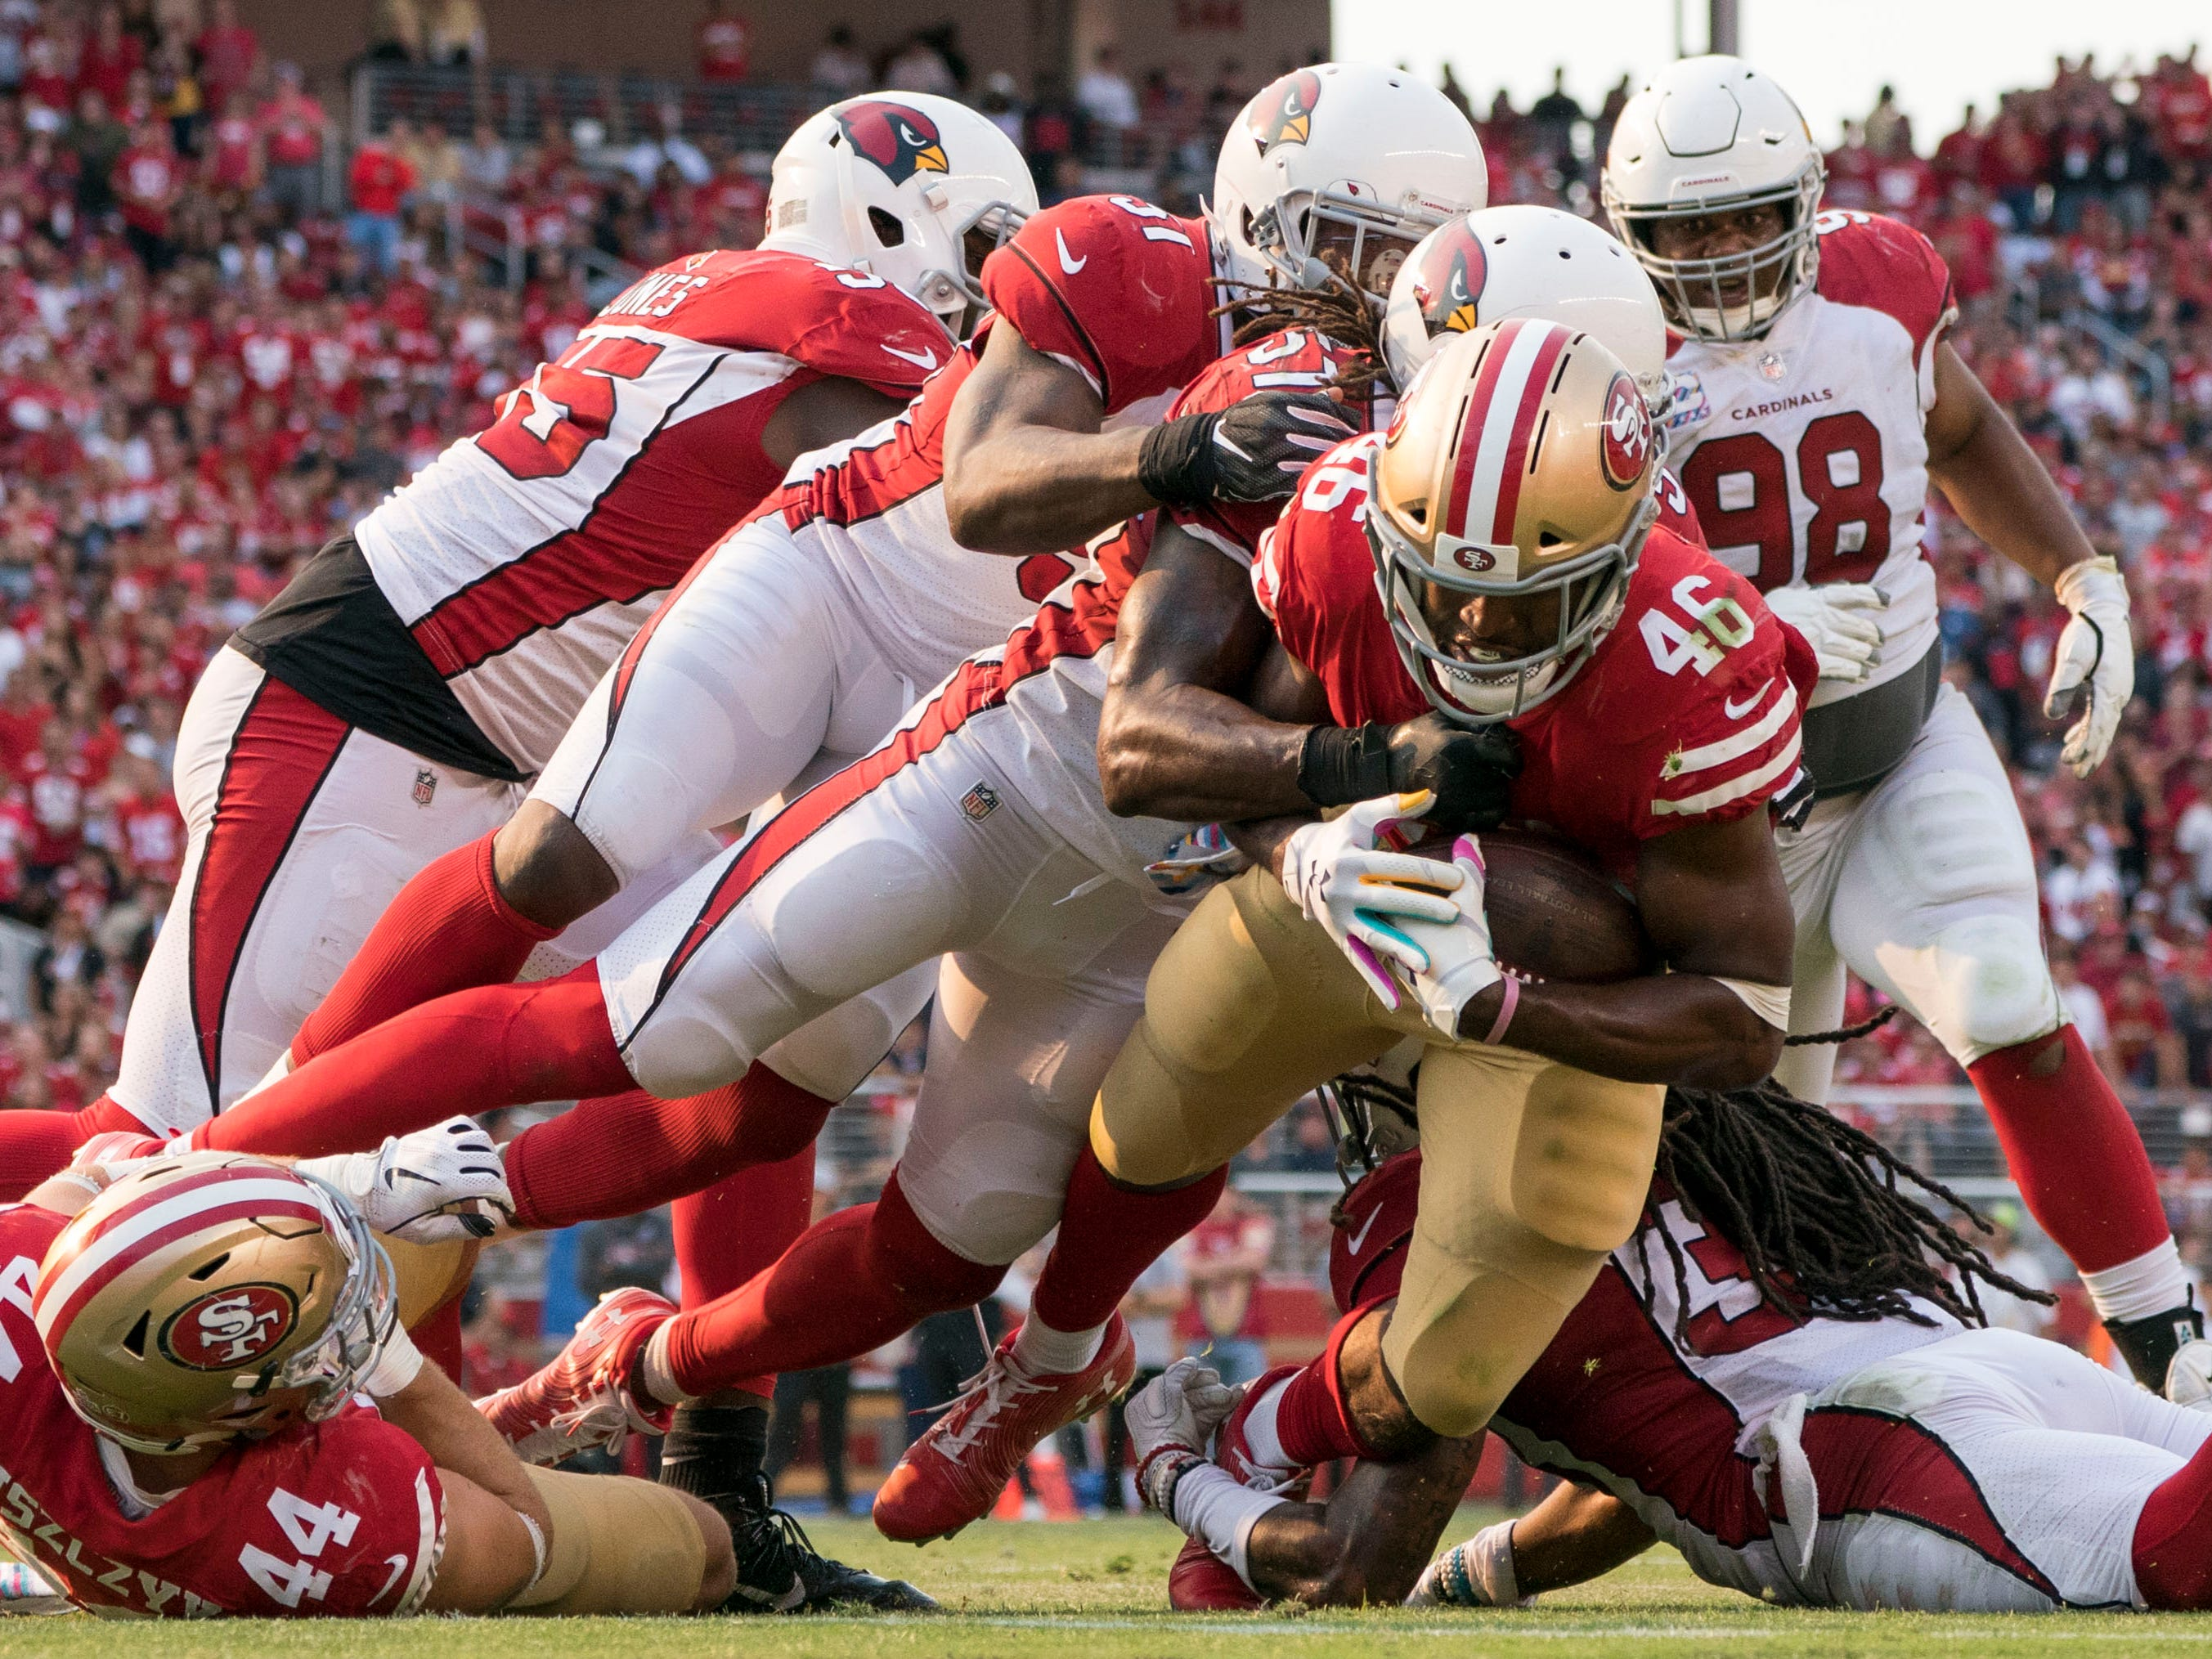 October 7, 2018; Santa Clara, CA, USA; San Francisco 49ers running back Alfred Morris (46) is tackled by the Arizona Cardinals during the fourth quarter at Levi's Stadium.